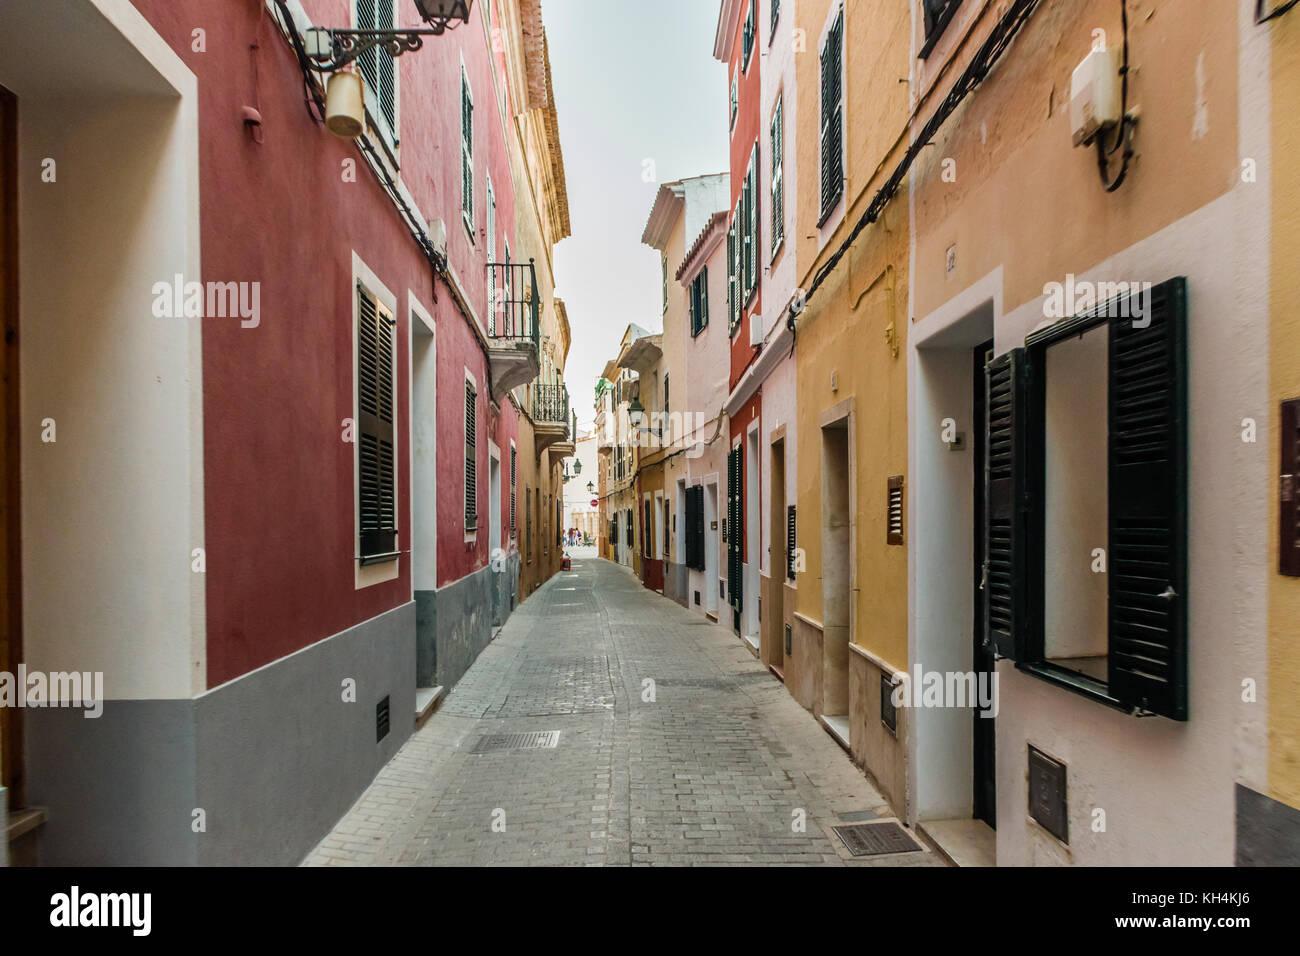 Streets of Ciutadella, Menorca - Stock Image